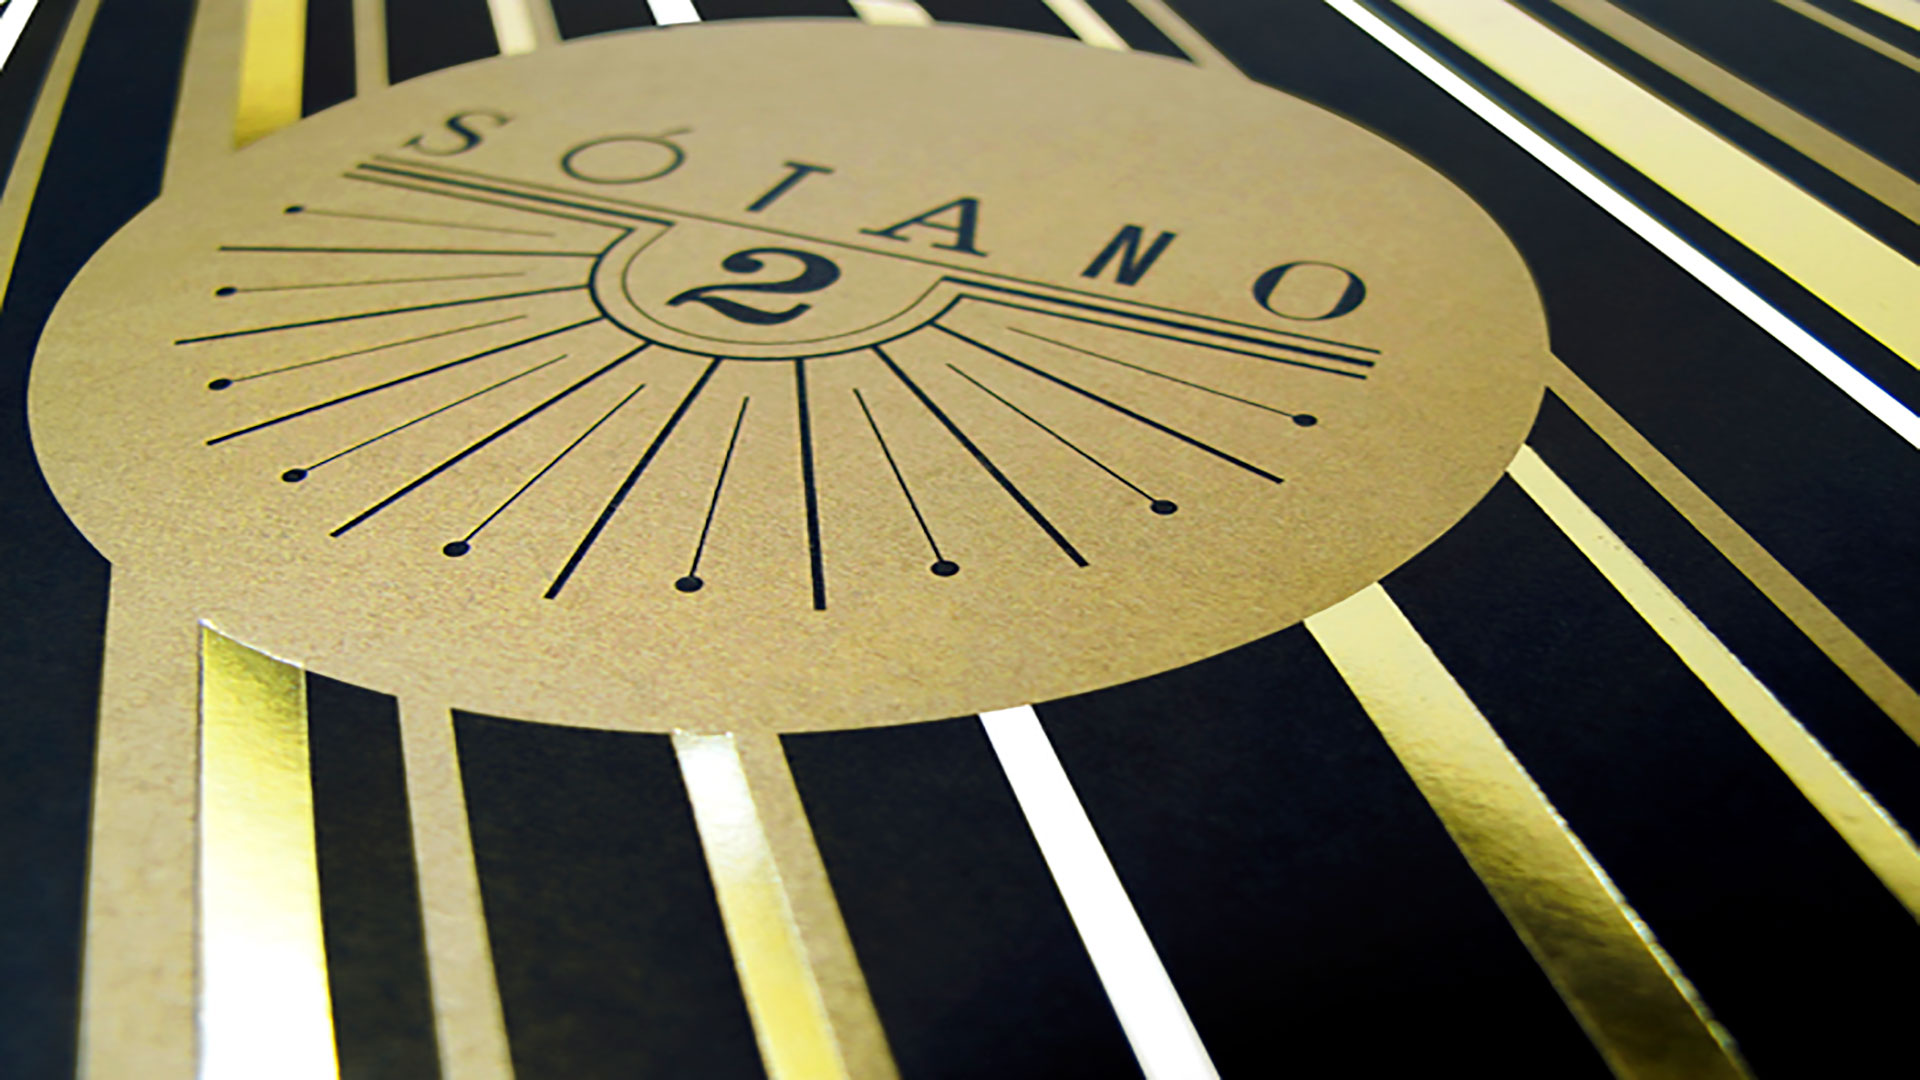 Detalle-menu-Sotano2